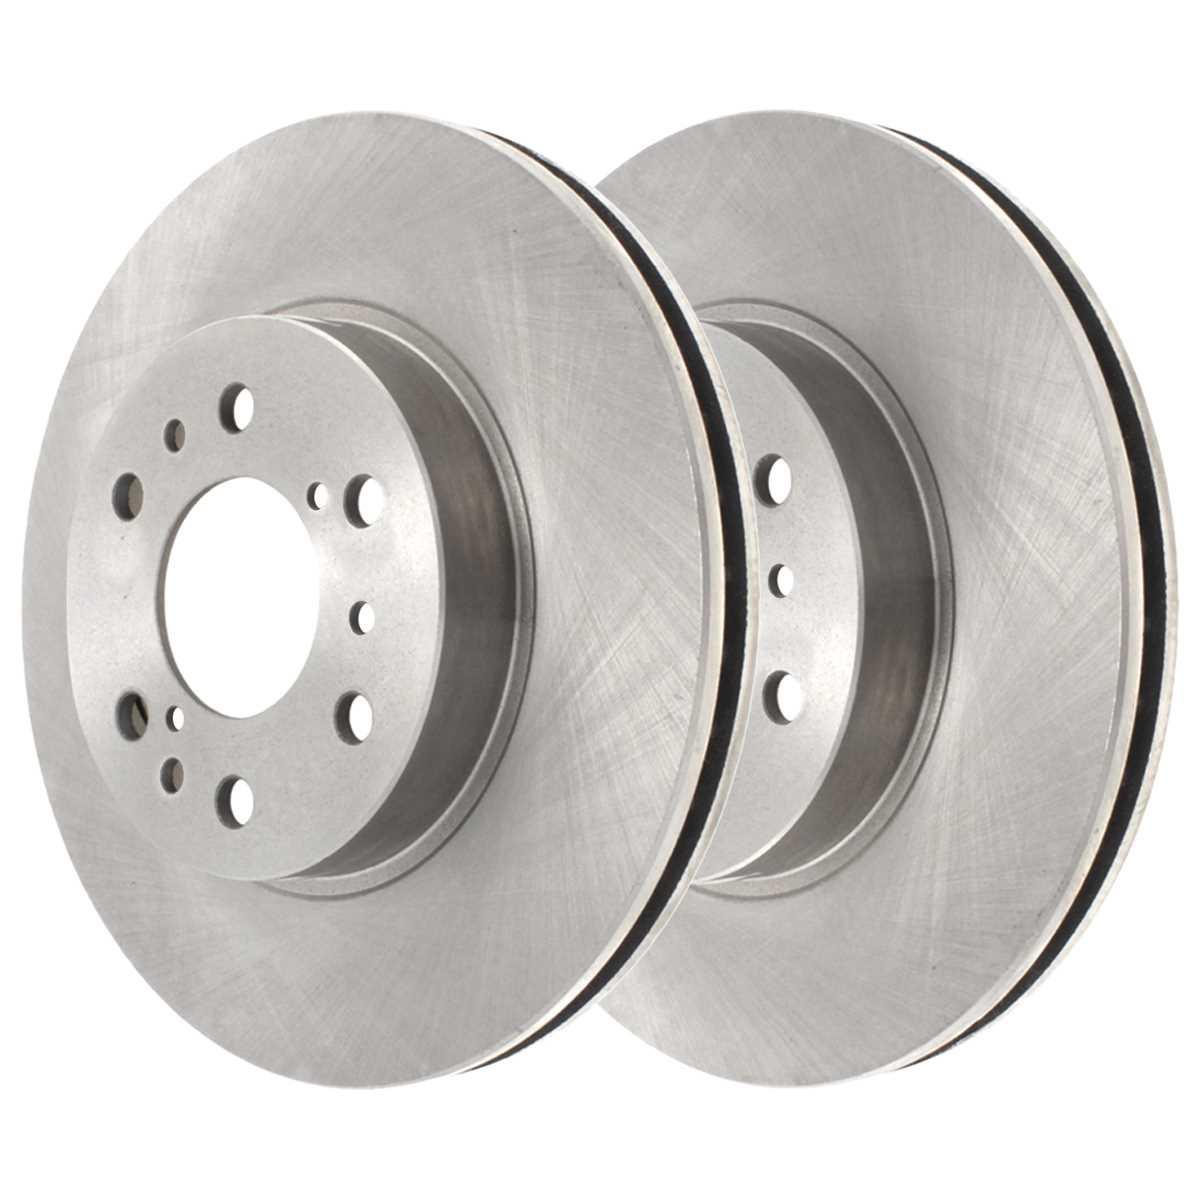 AutoShack RSMK65072-65072-844-2-4 Front Brake Rotors and Semi Metallic Pads